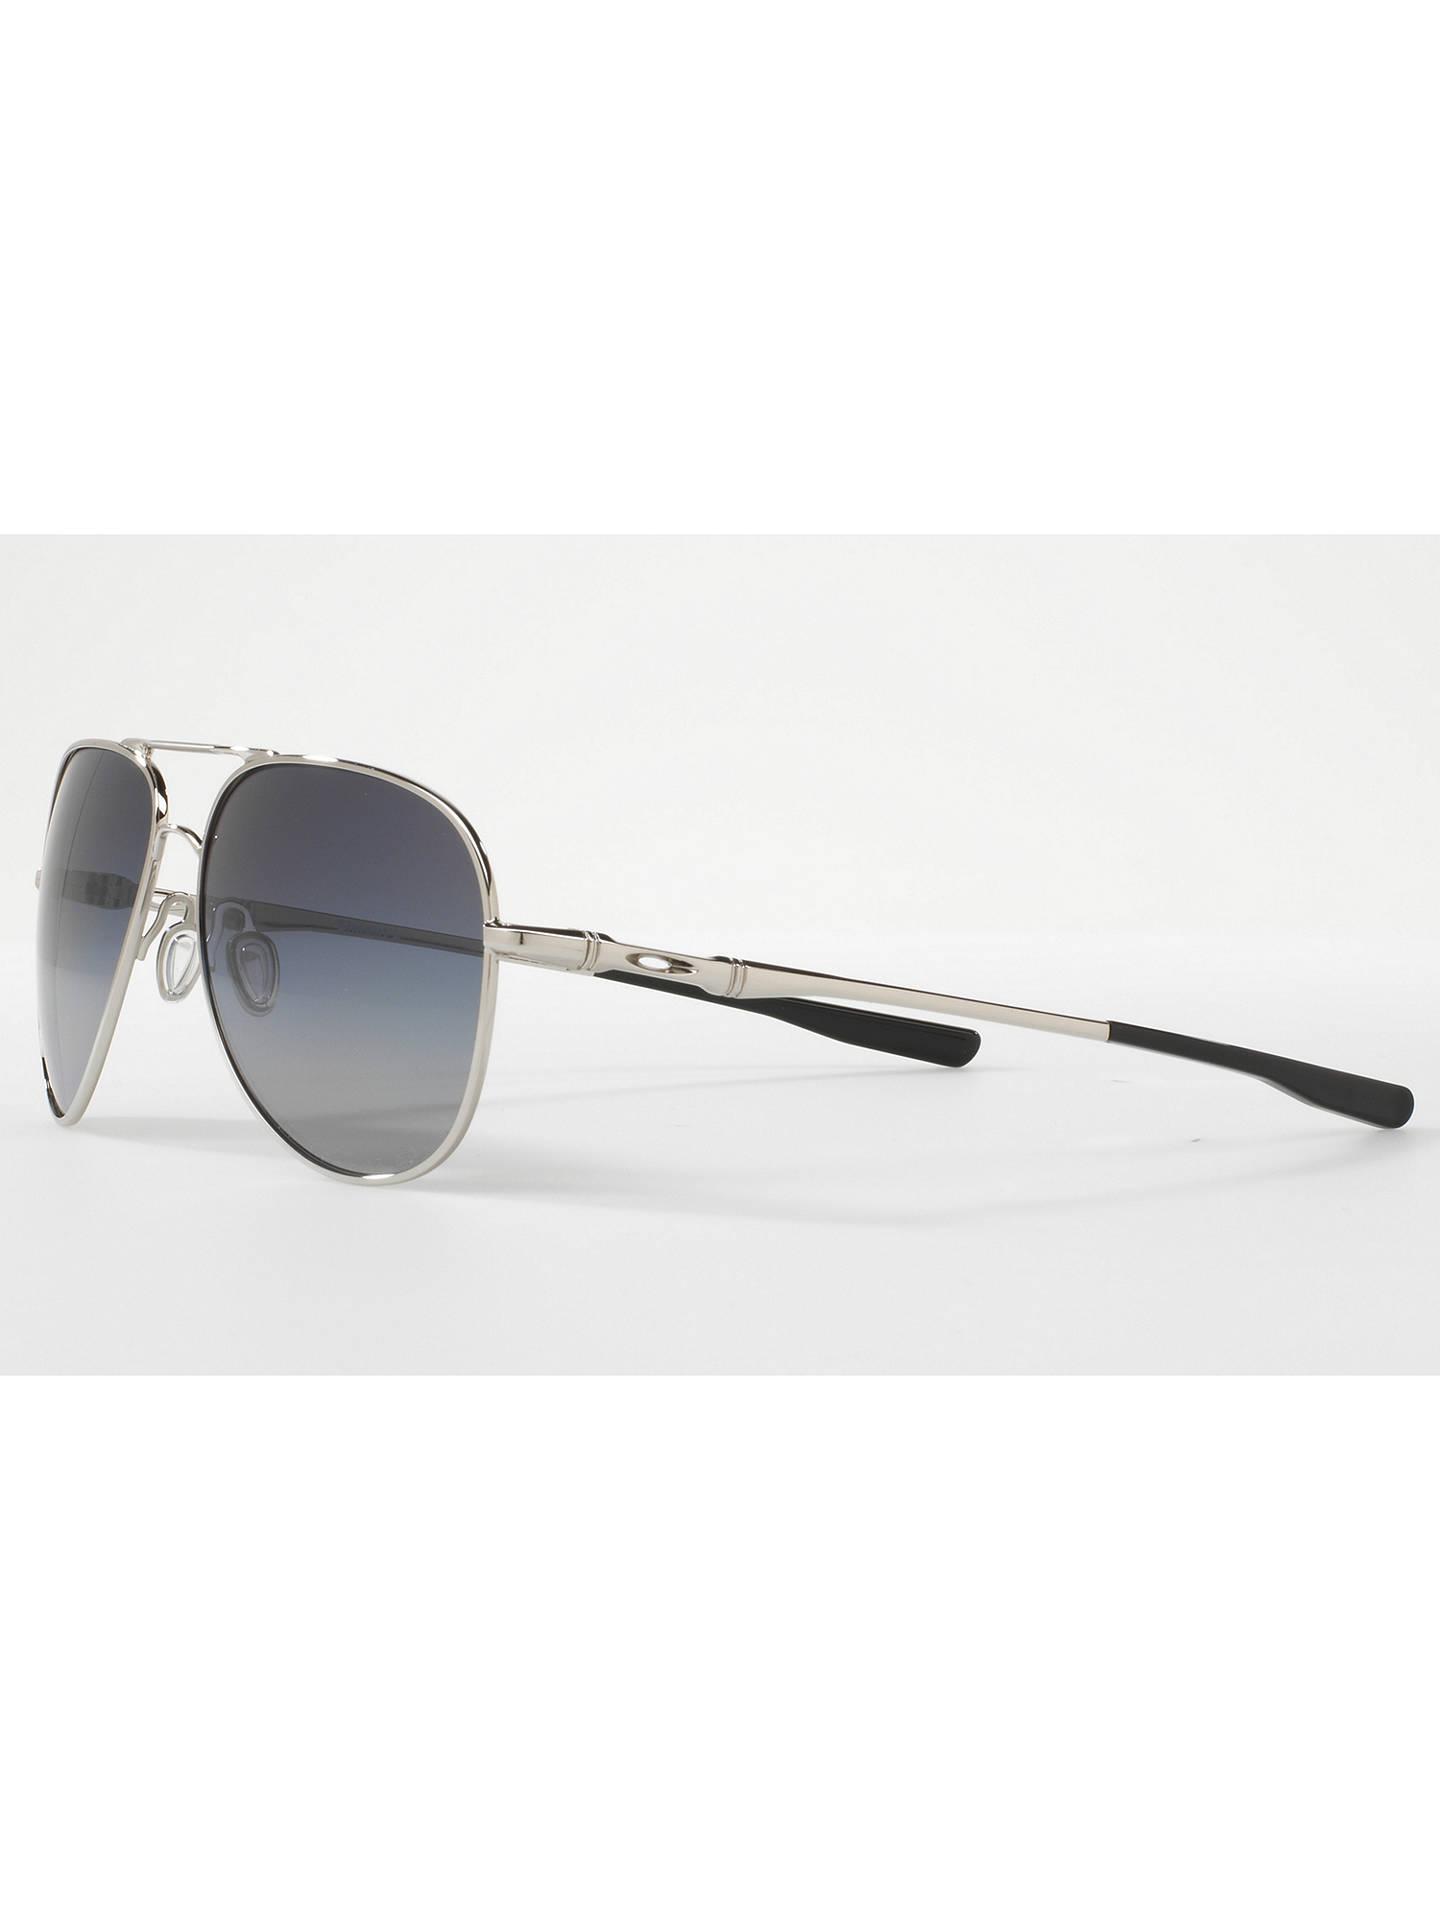 9373a9c7ea Oakley OO4119 Elmont Large Polarised Aviator Sunglasses at John ...